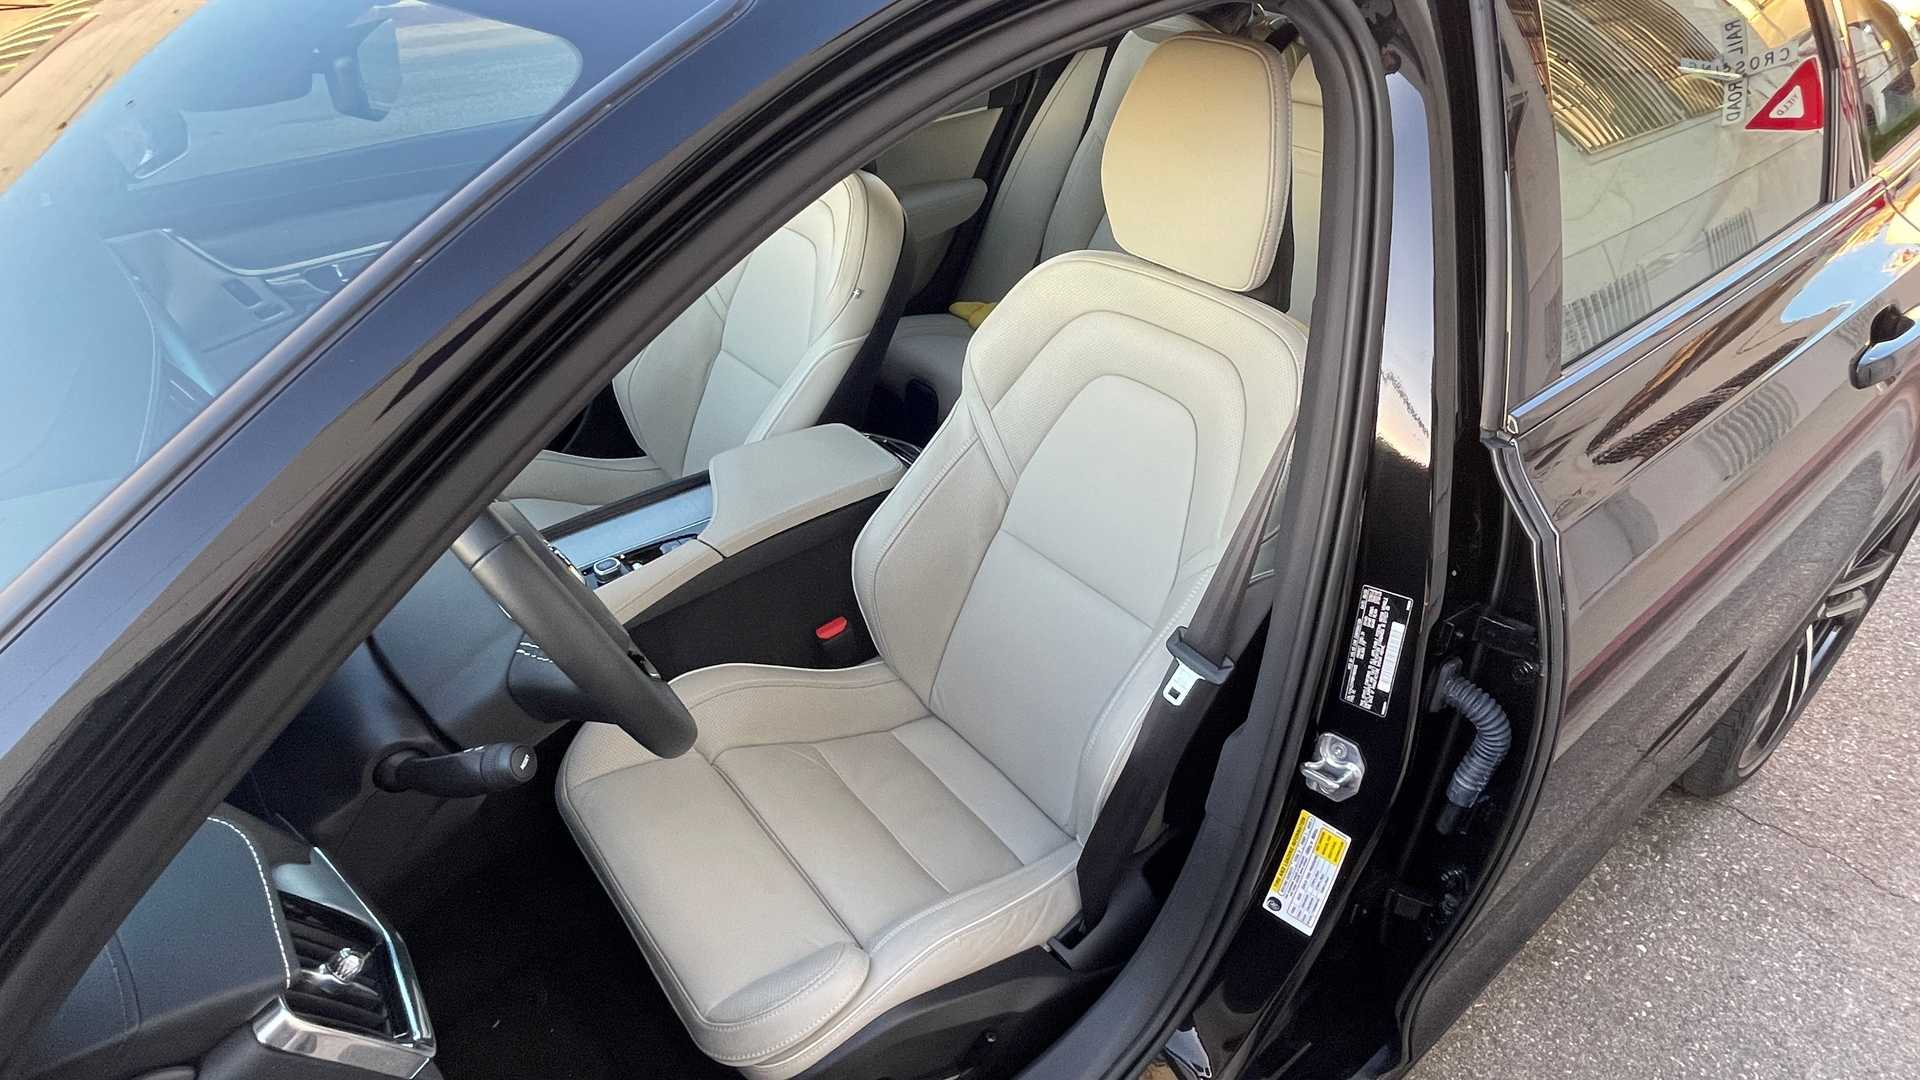 2021-volvo-v90-t6-r-design-awd-interior-front-seats.jpg